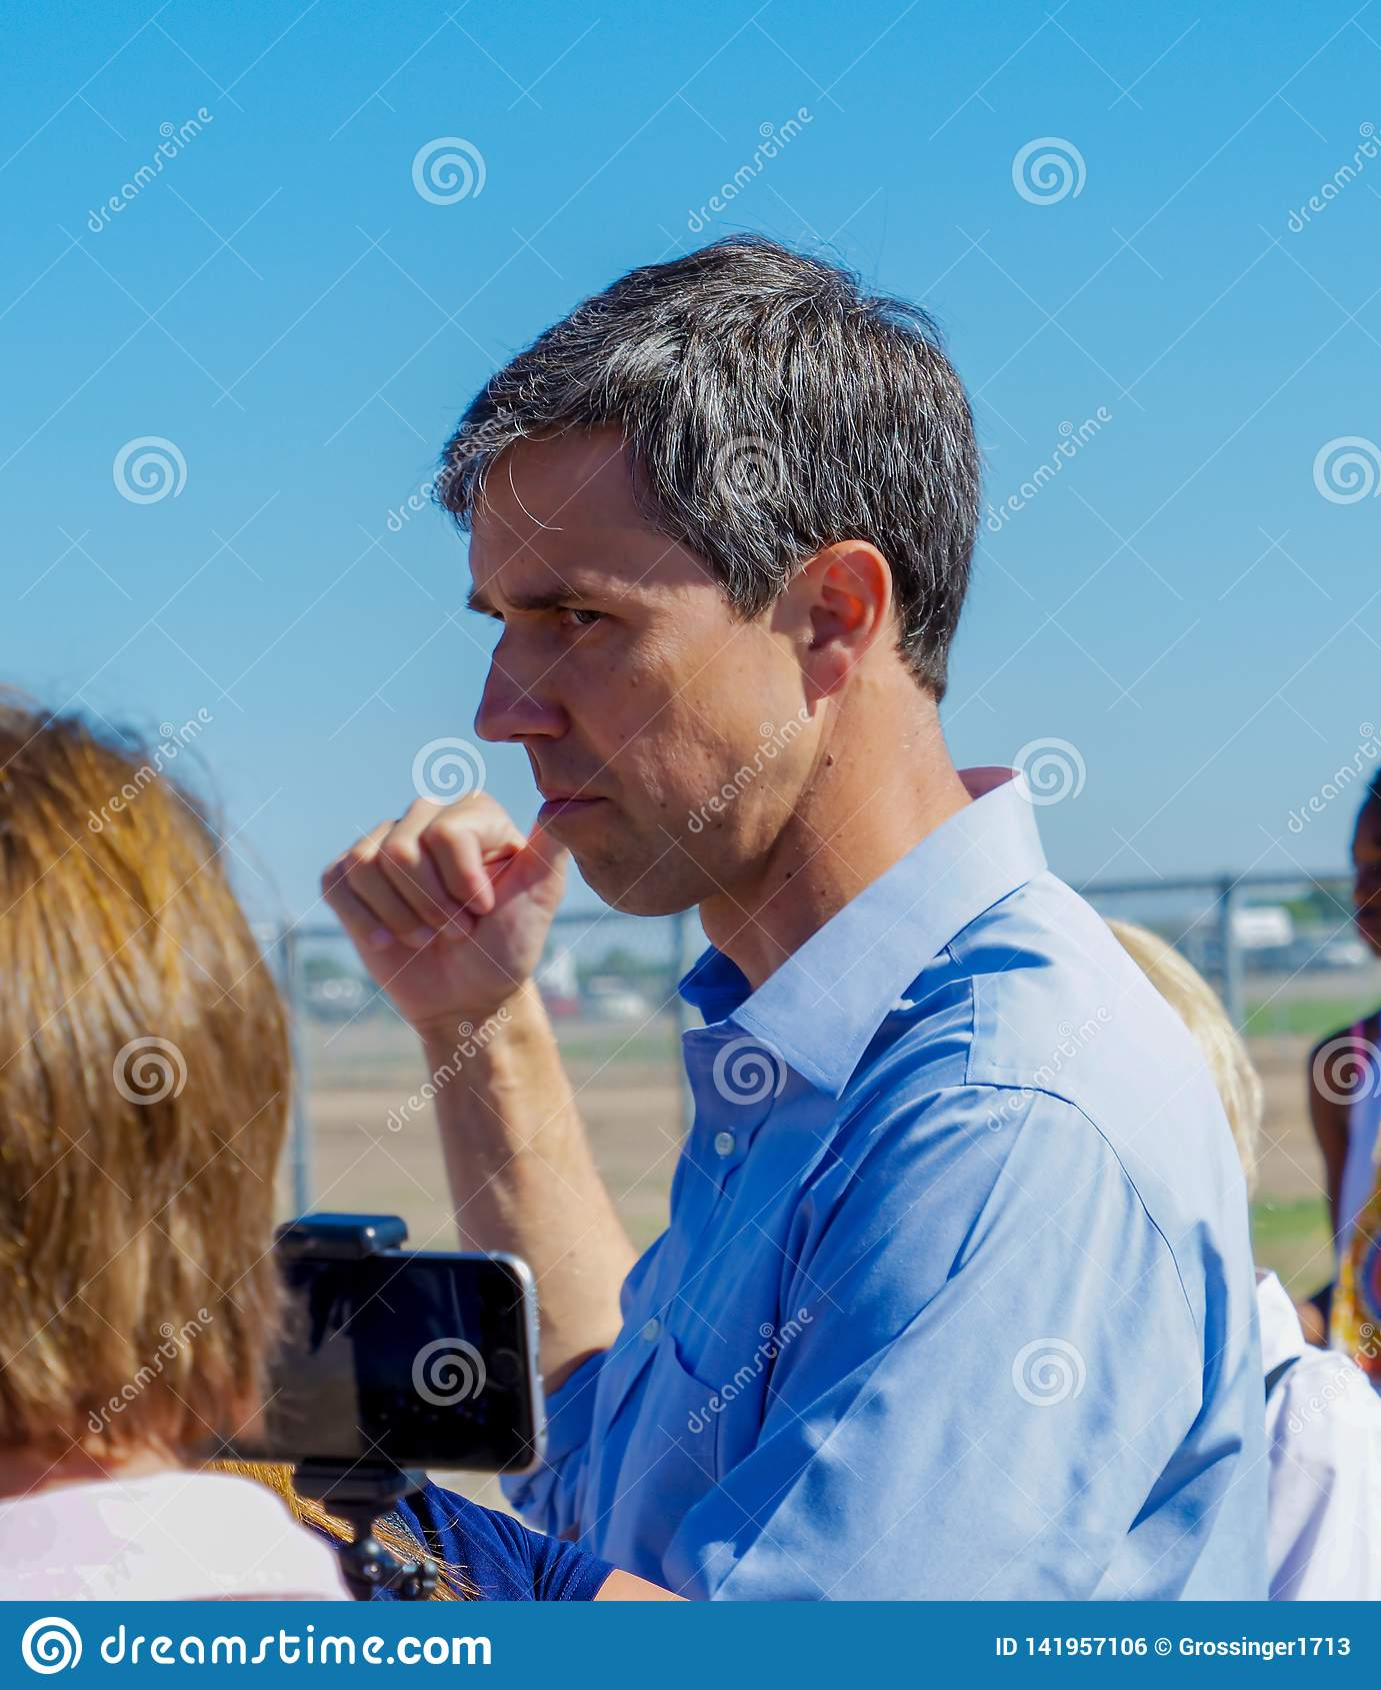 Presidentiële kandidaat Beto O' Rourke